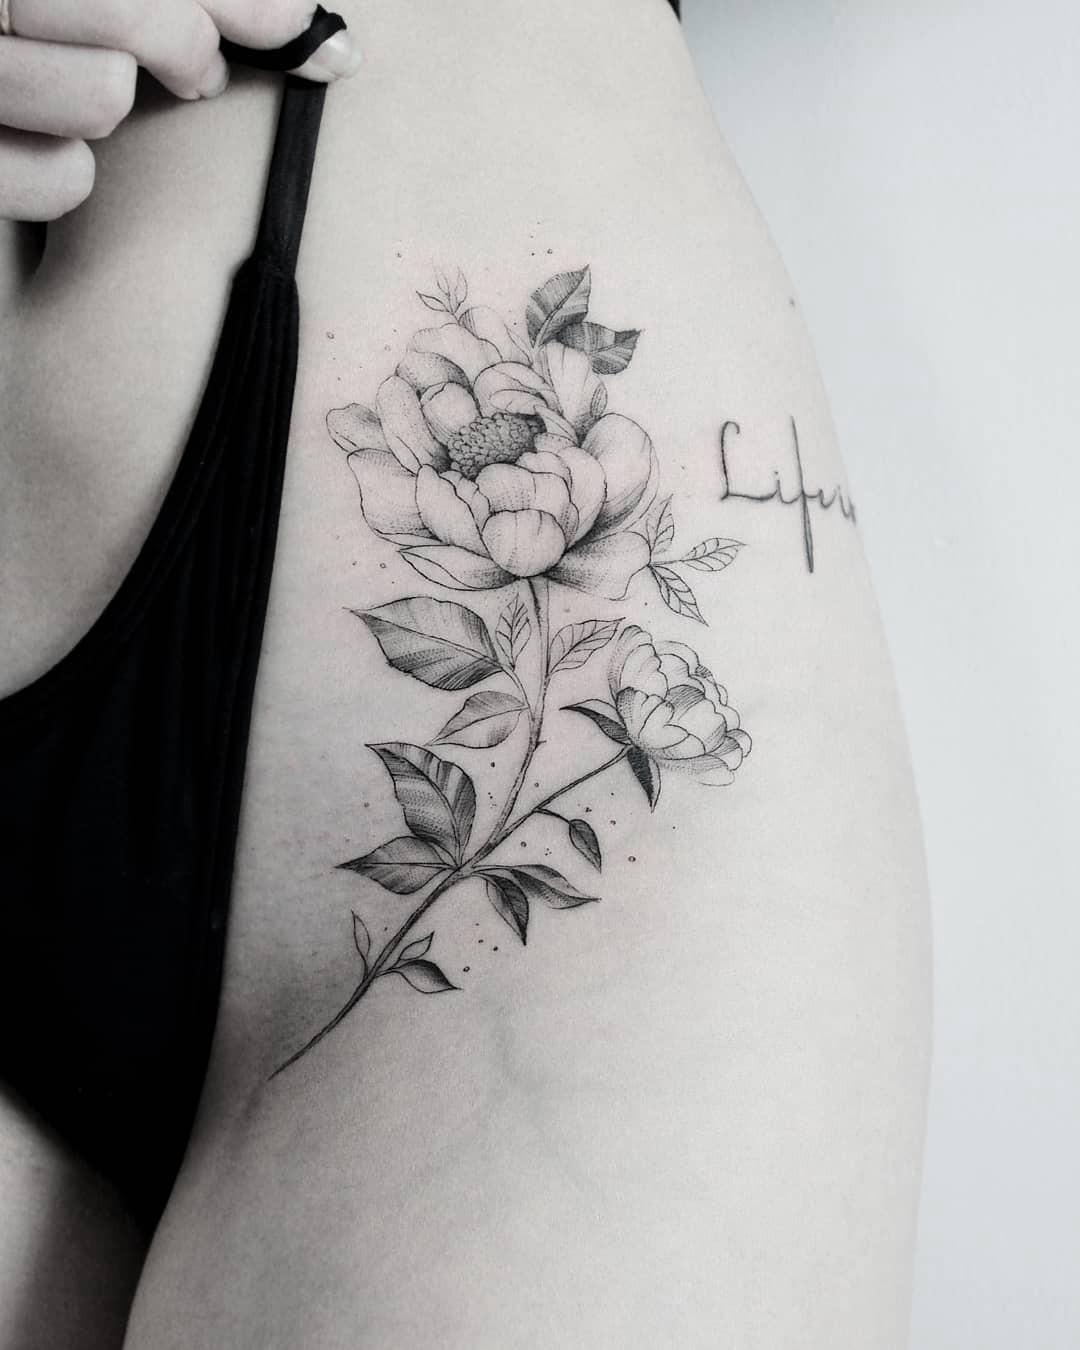 Small flowers on women thigh tattoo ideas